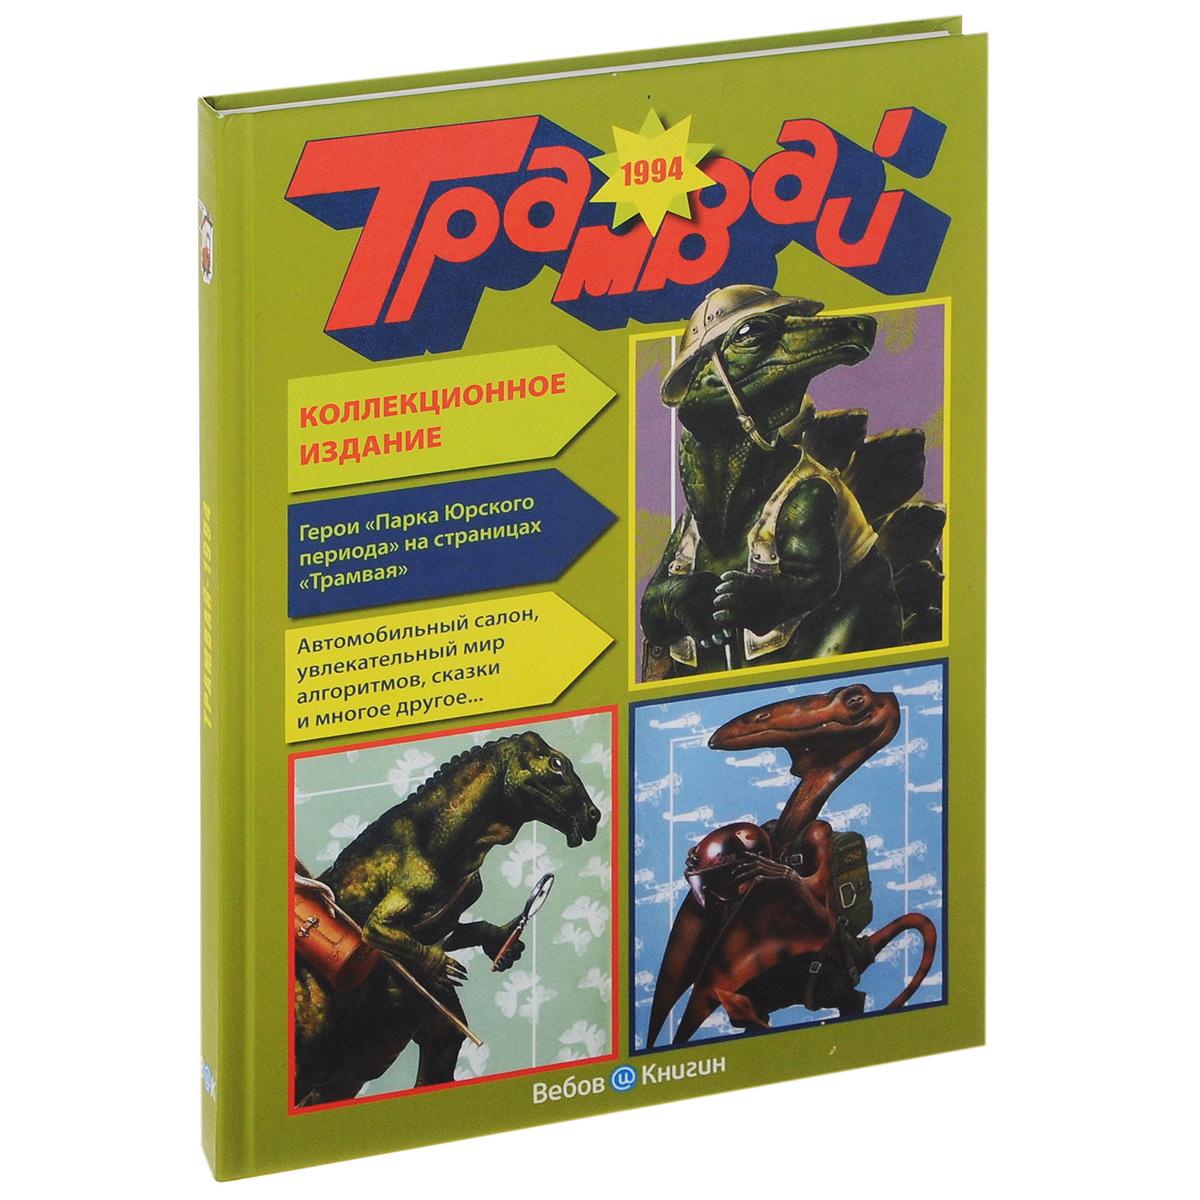 Годовая подшивка журнала Трамвай, 1994 год